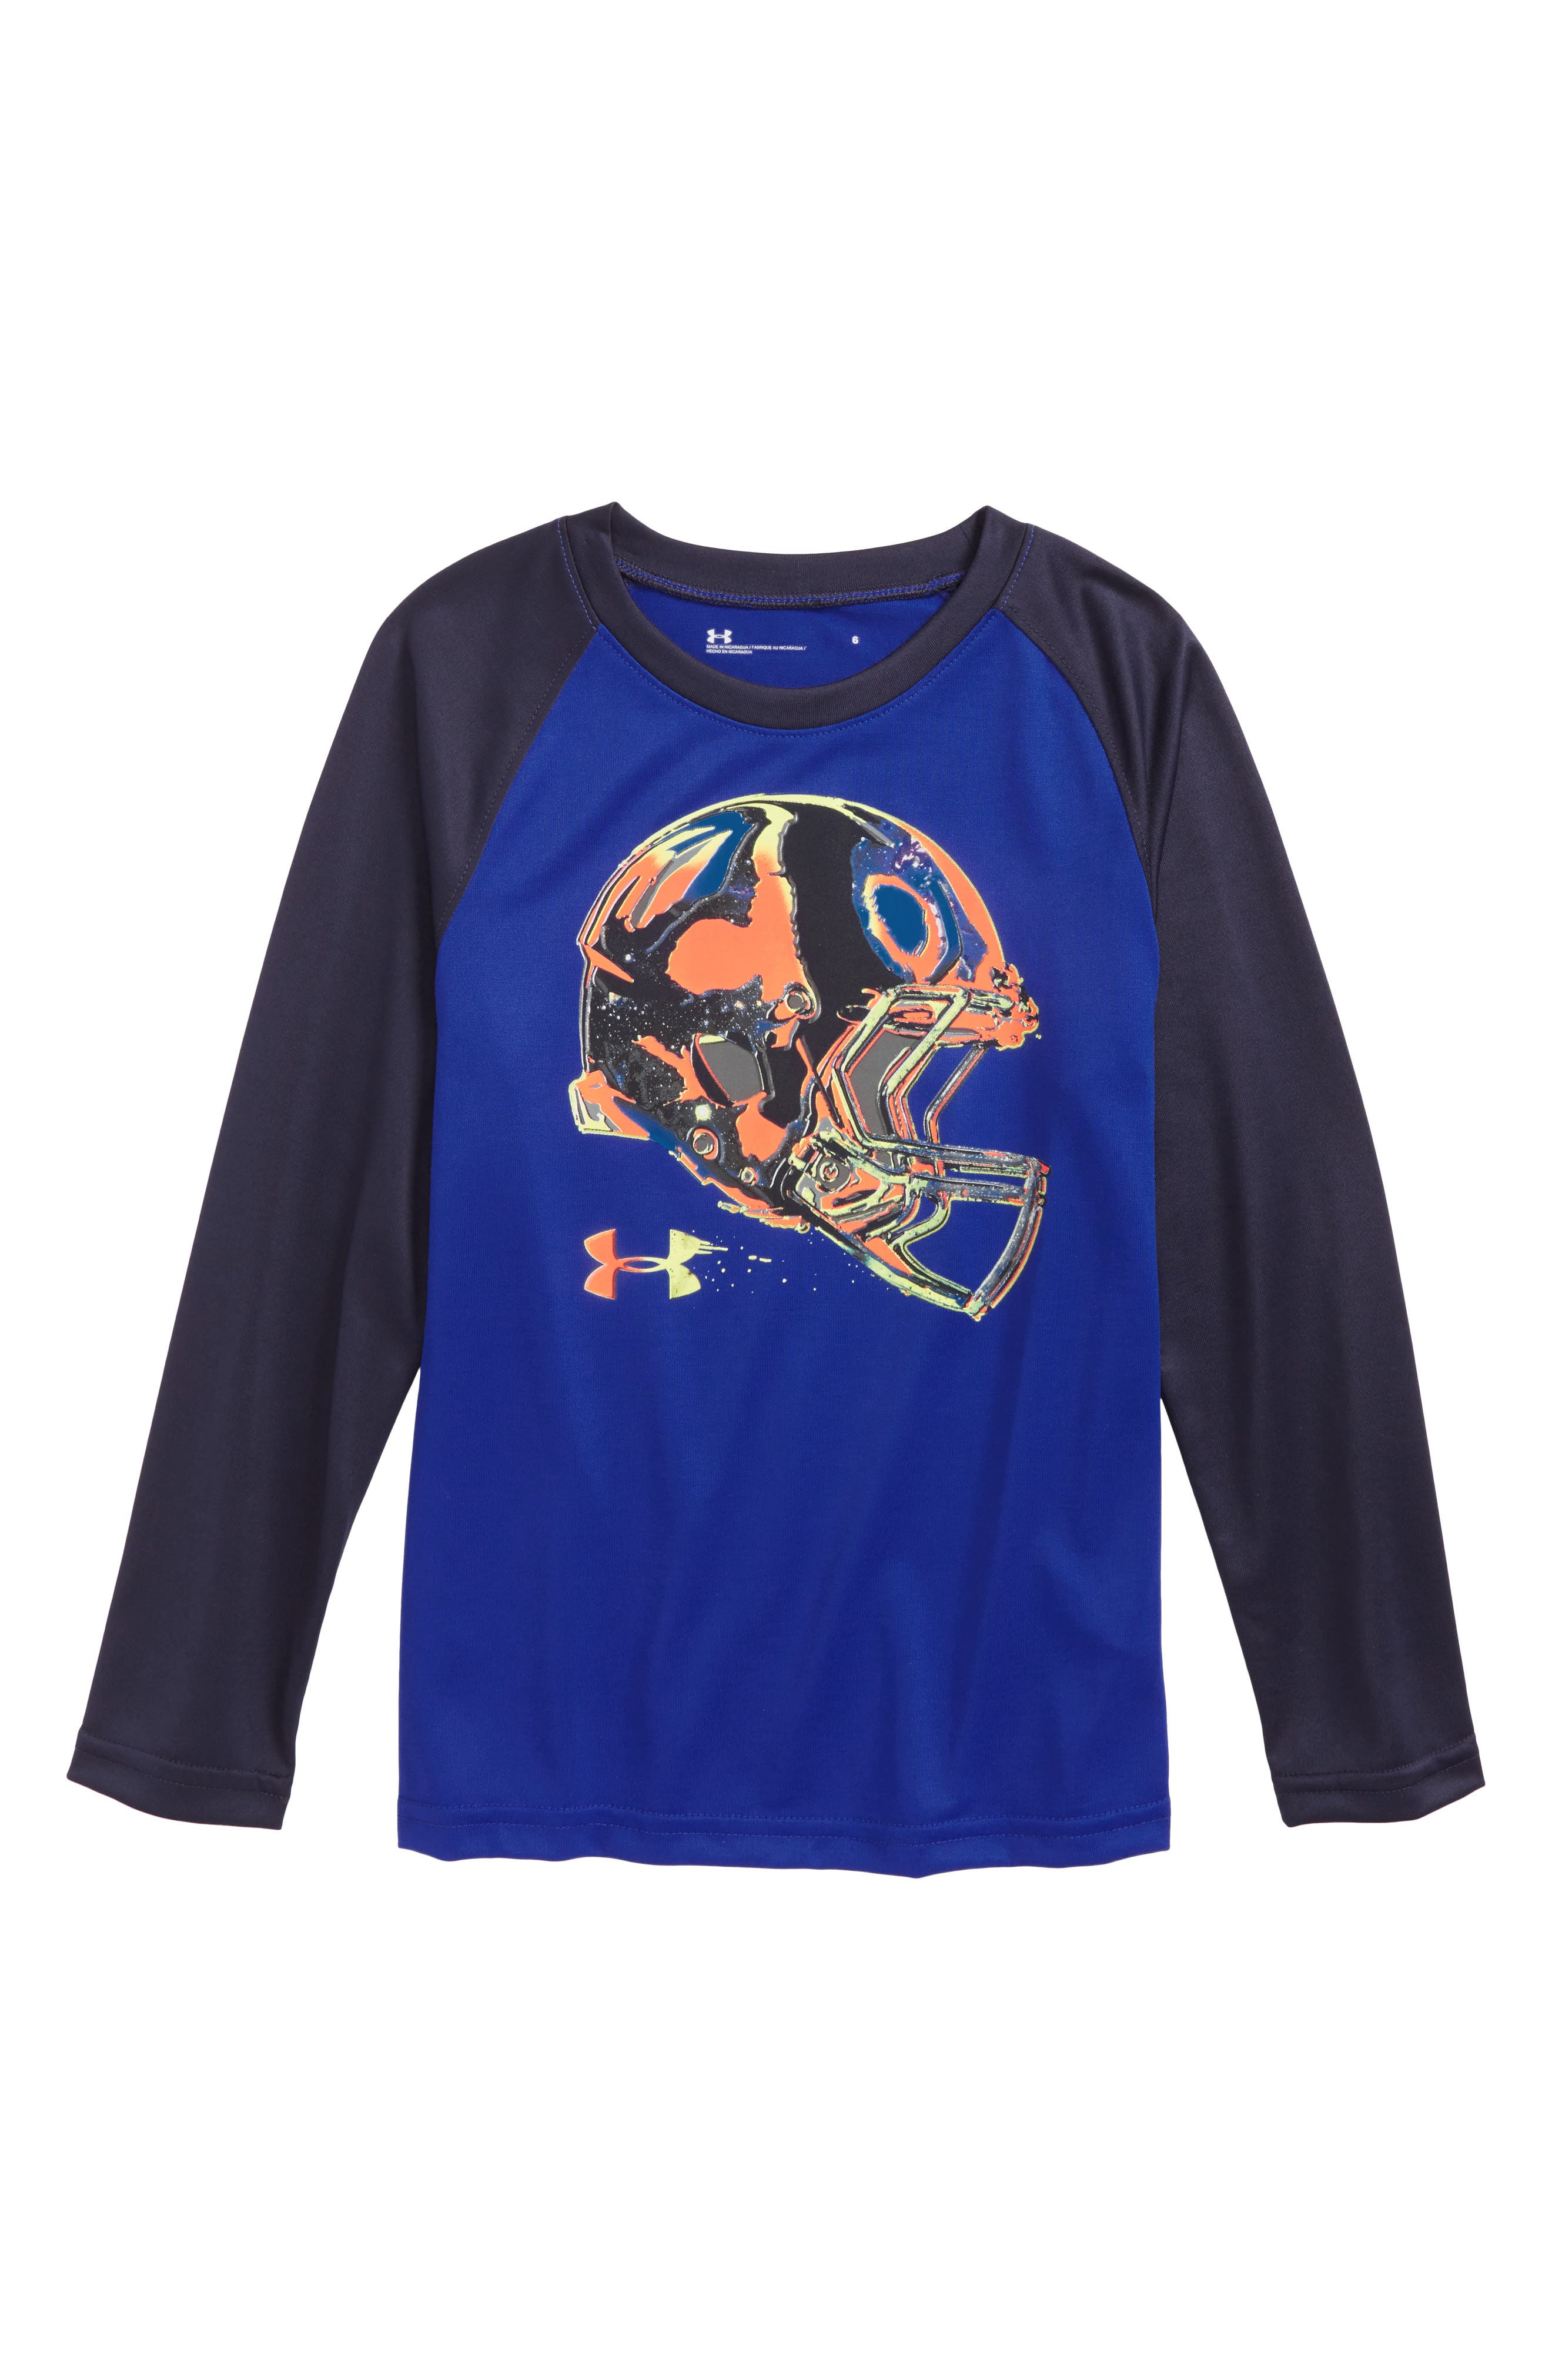 Main Image - Under Armour Accelerate Raglan T-Shirt (Toddler Boys & Little Boys)